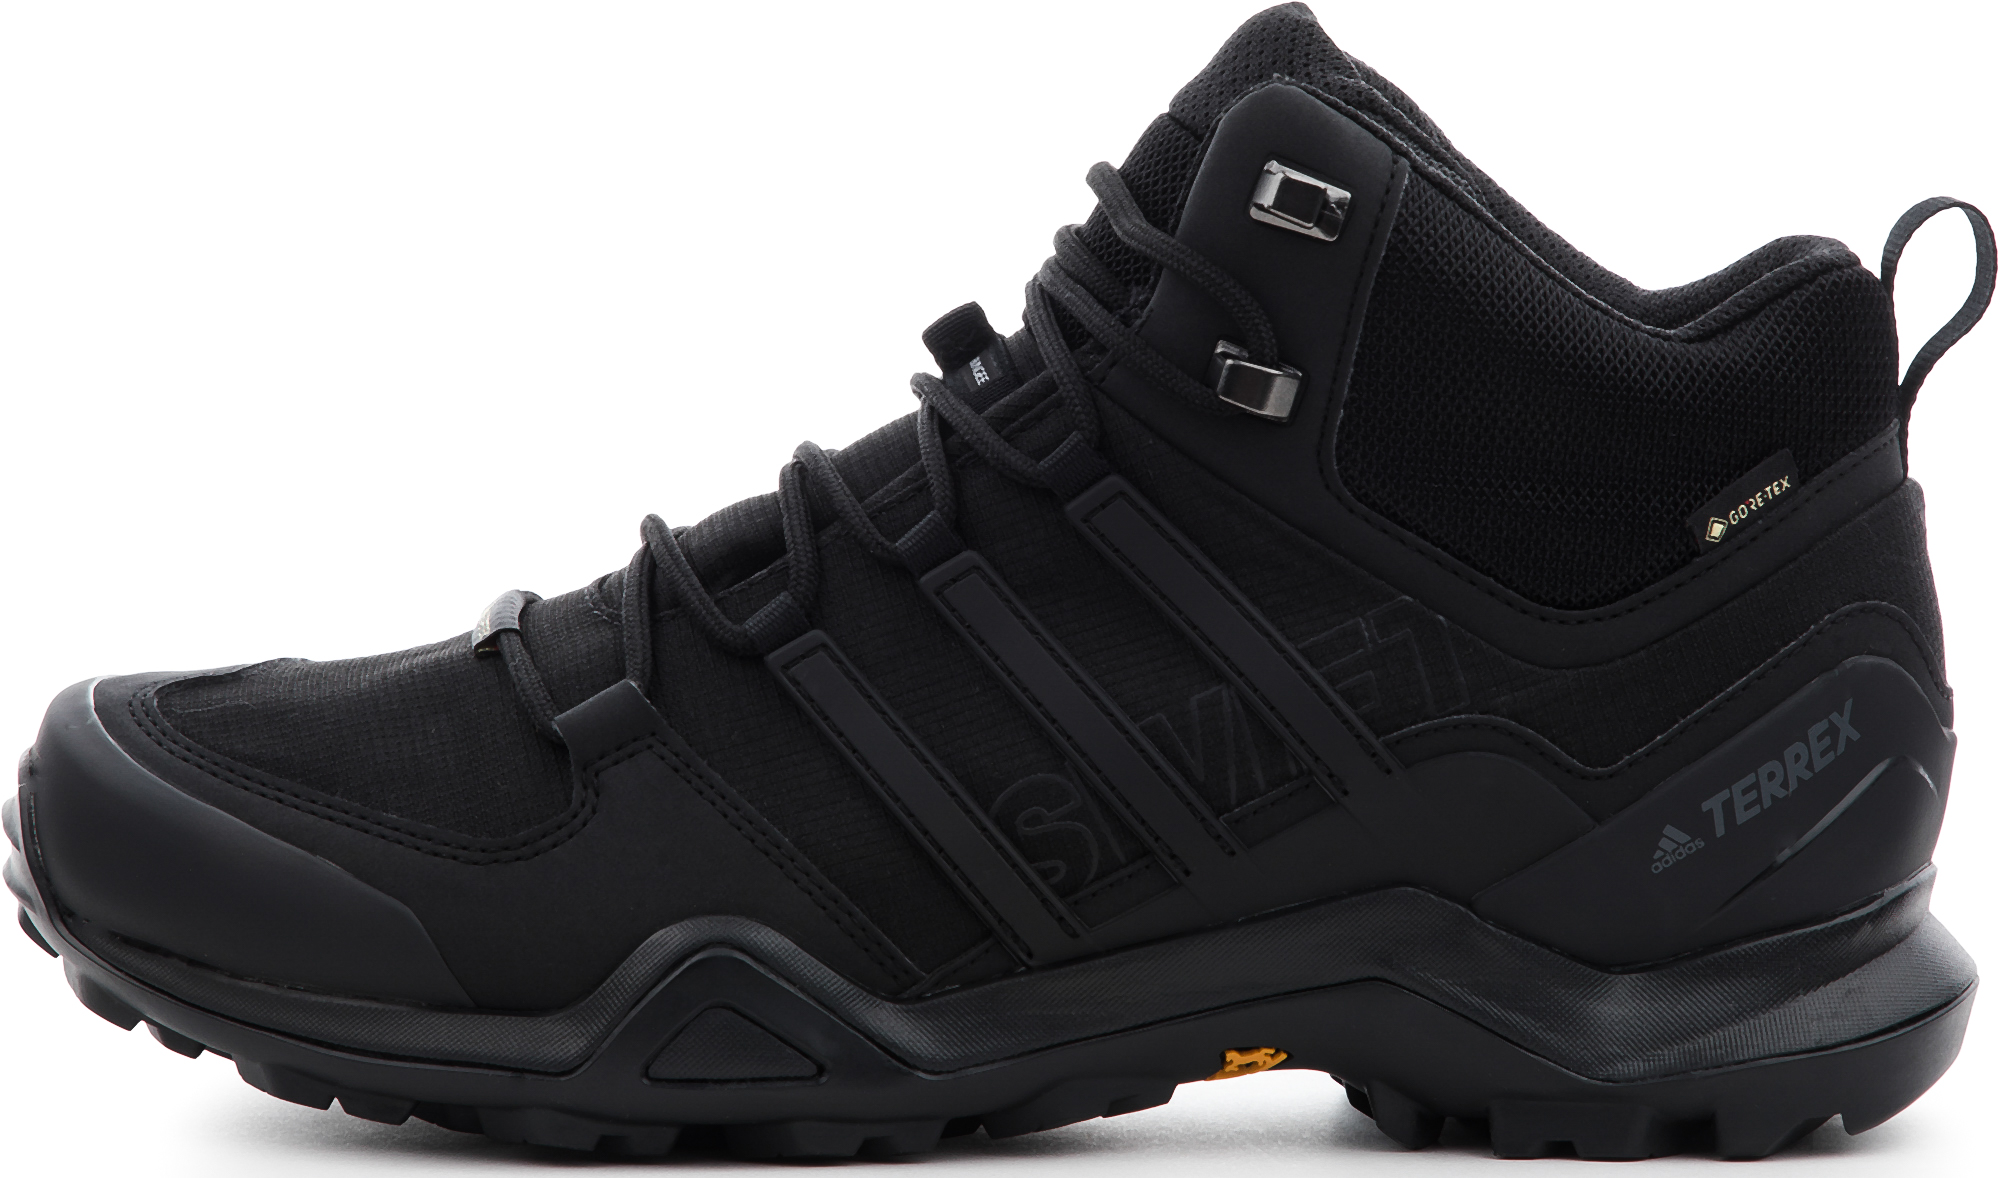 Adidas Ботинки мужские Adidas Terrex Swift R2, размер 43 adidas ботинки мужские adidas terrex tivid mid climaproof размер 40